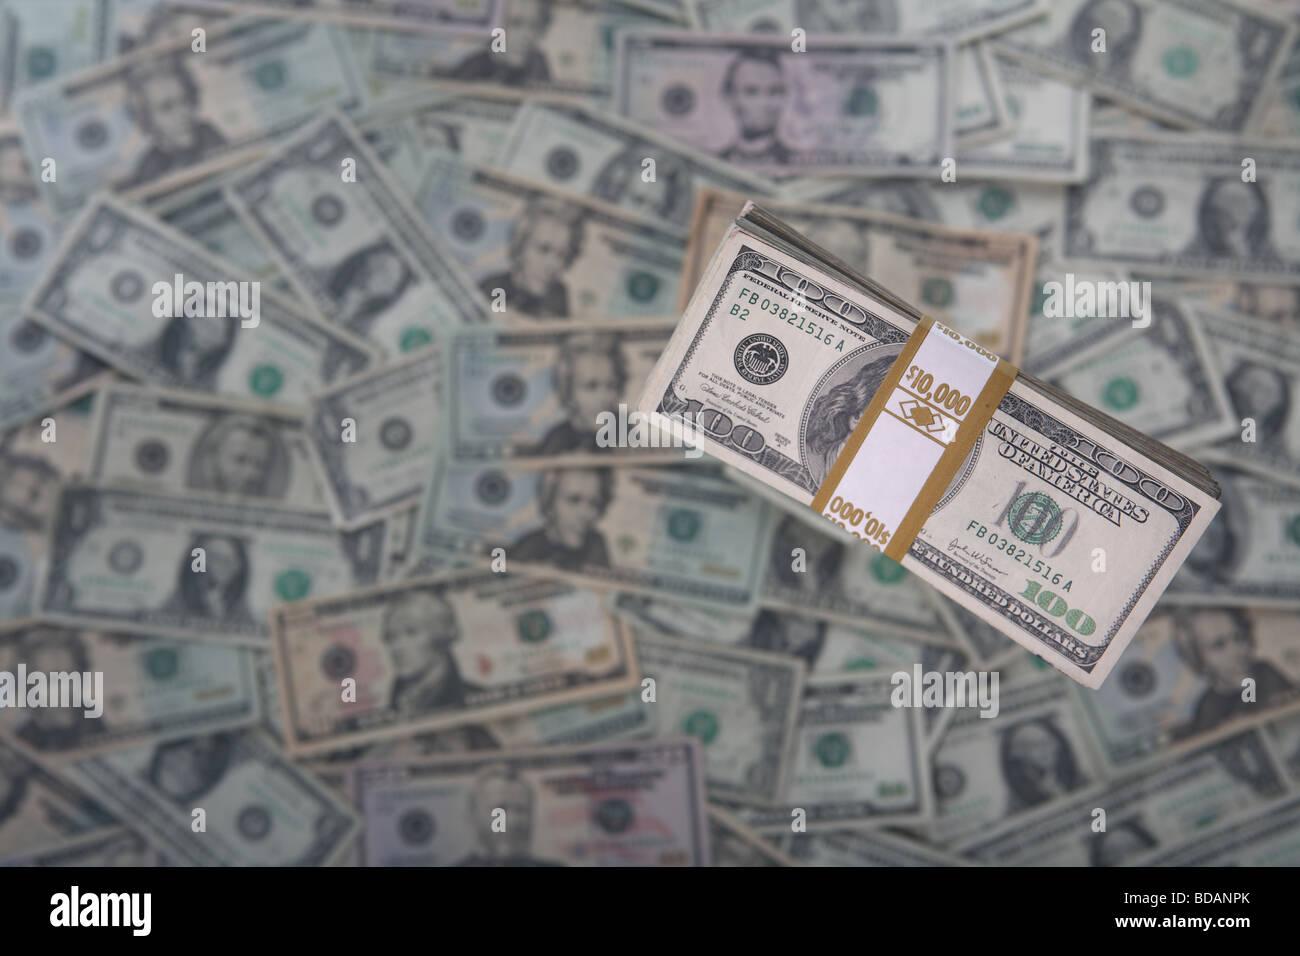 Printing Money Us Mint Stock Photos & Printing Money Us Mint Stock